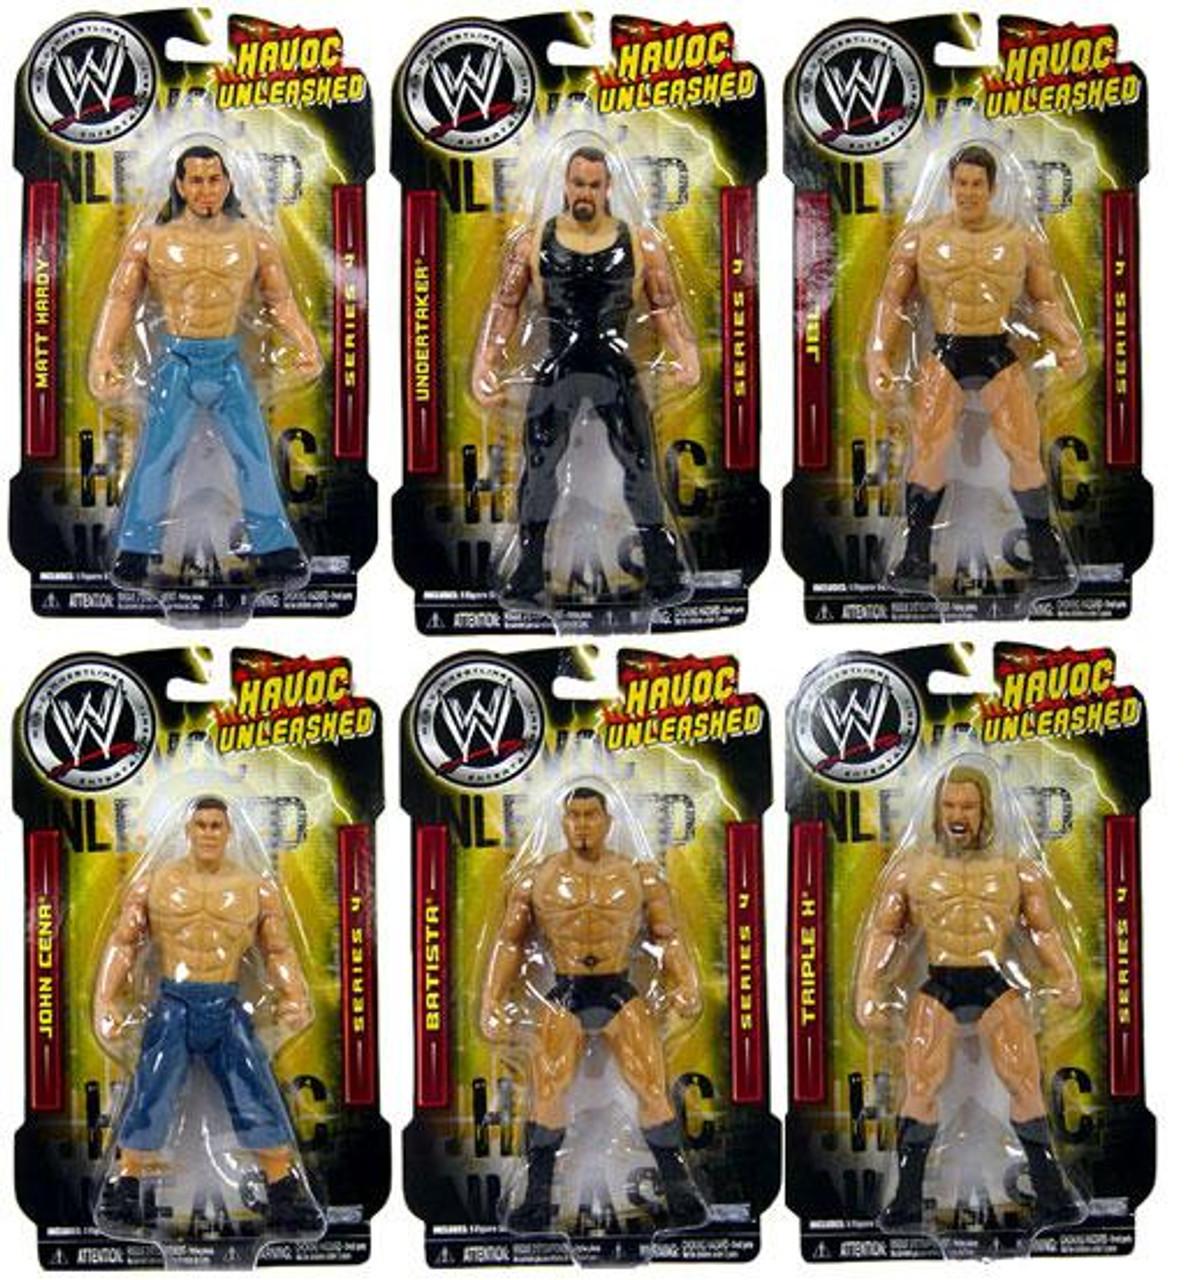 WWE Wrestling Havoc Unleashed Series 4 Set of 6 Action Figures